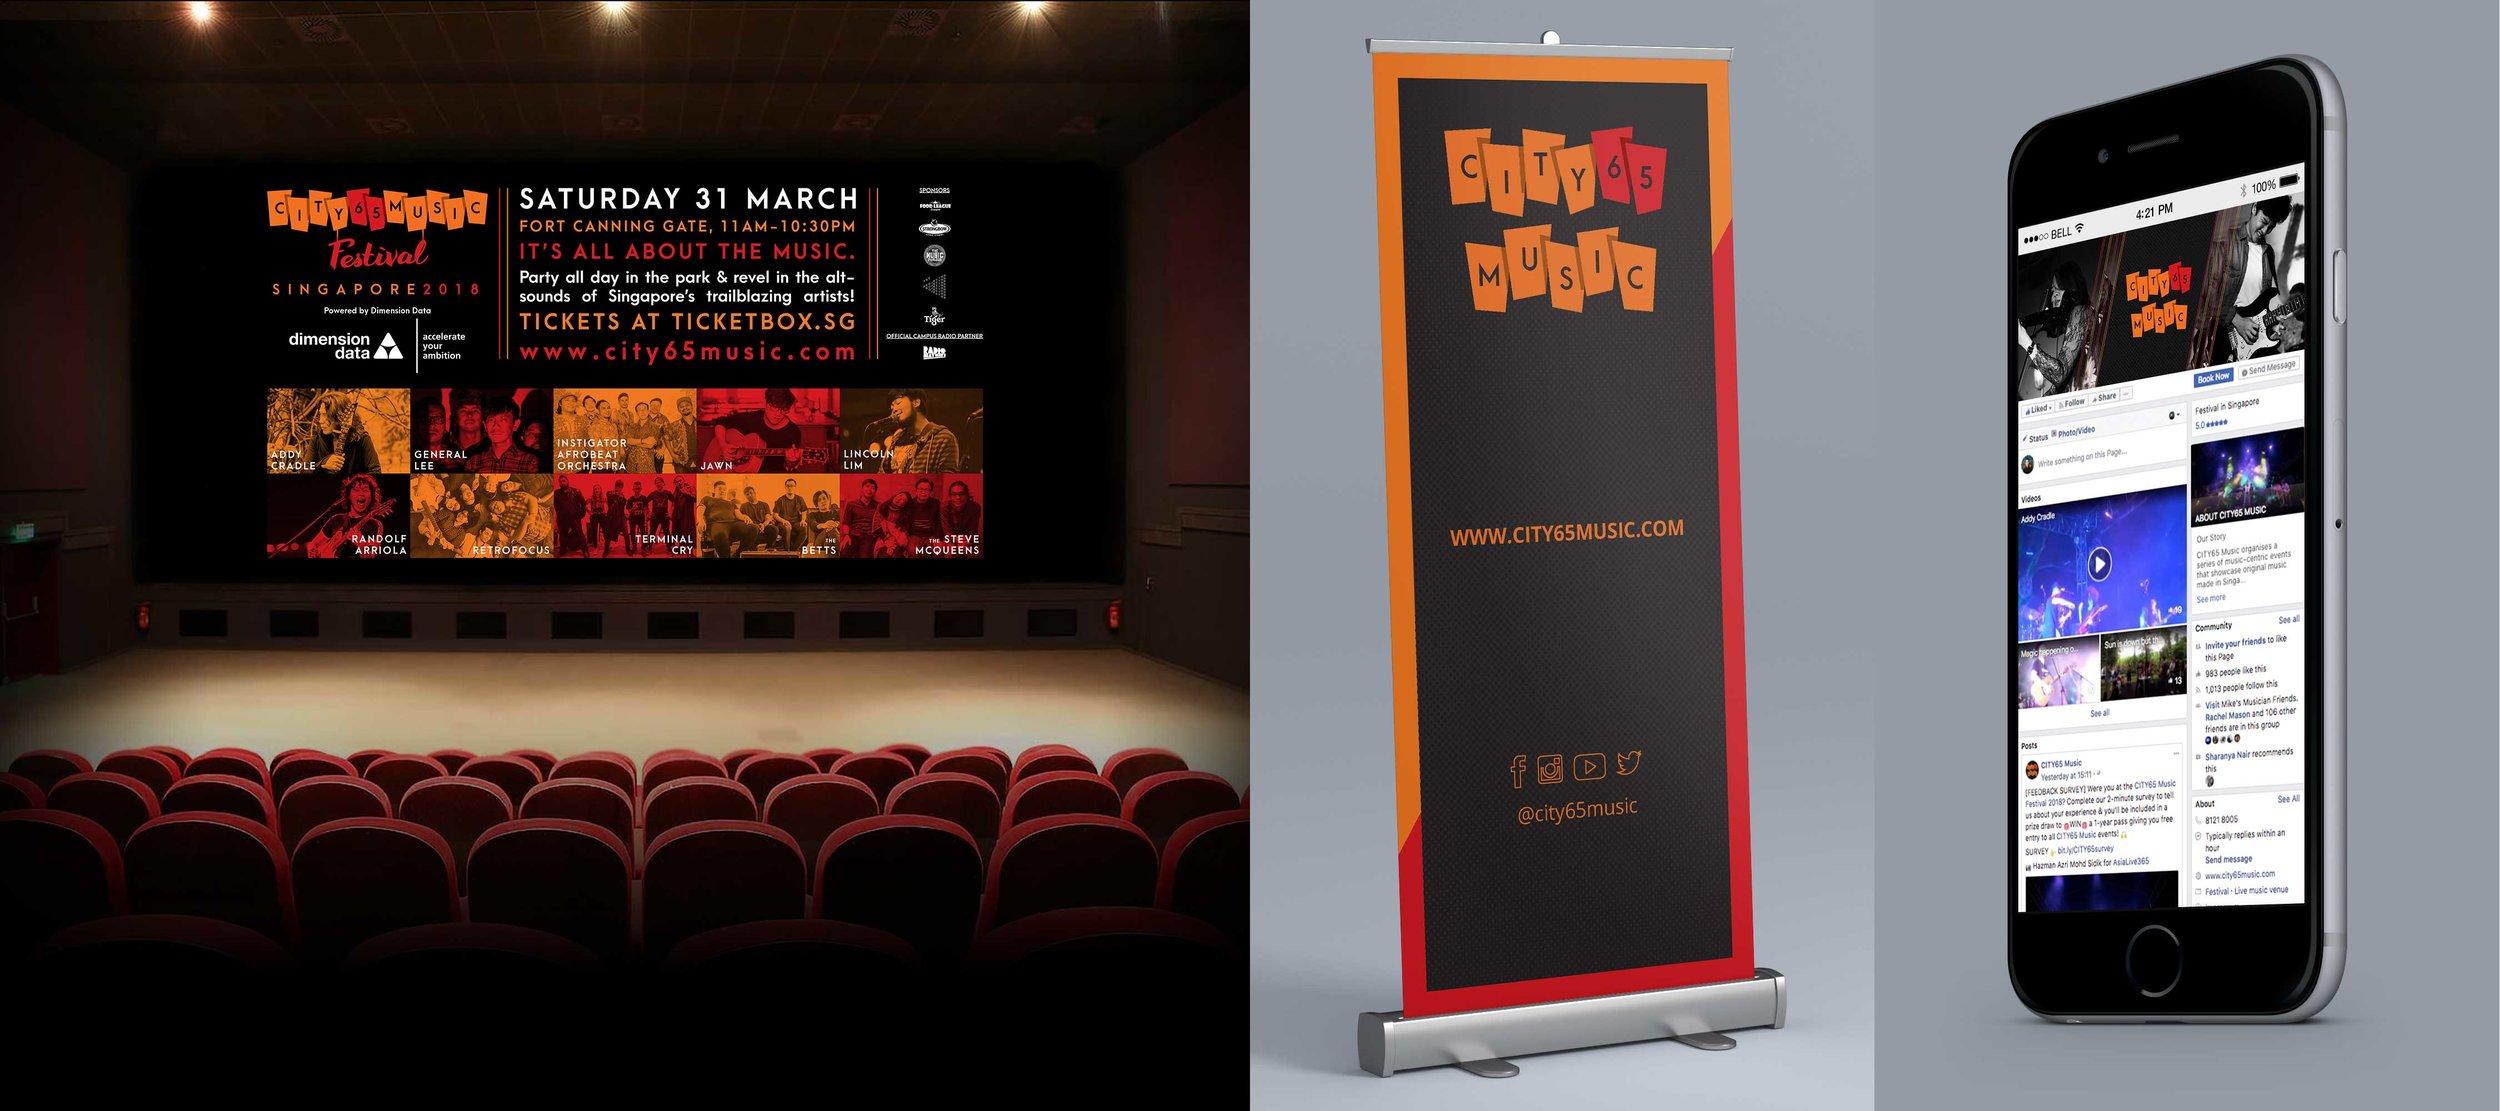 Promo assets - Cinema ad slide, pull-up banner, social media banners